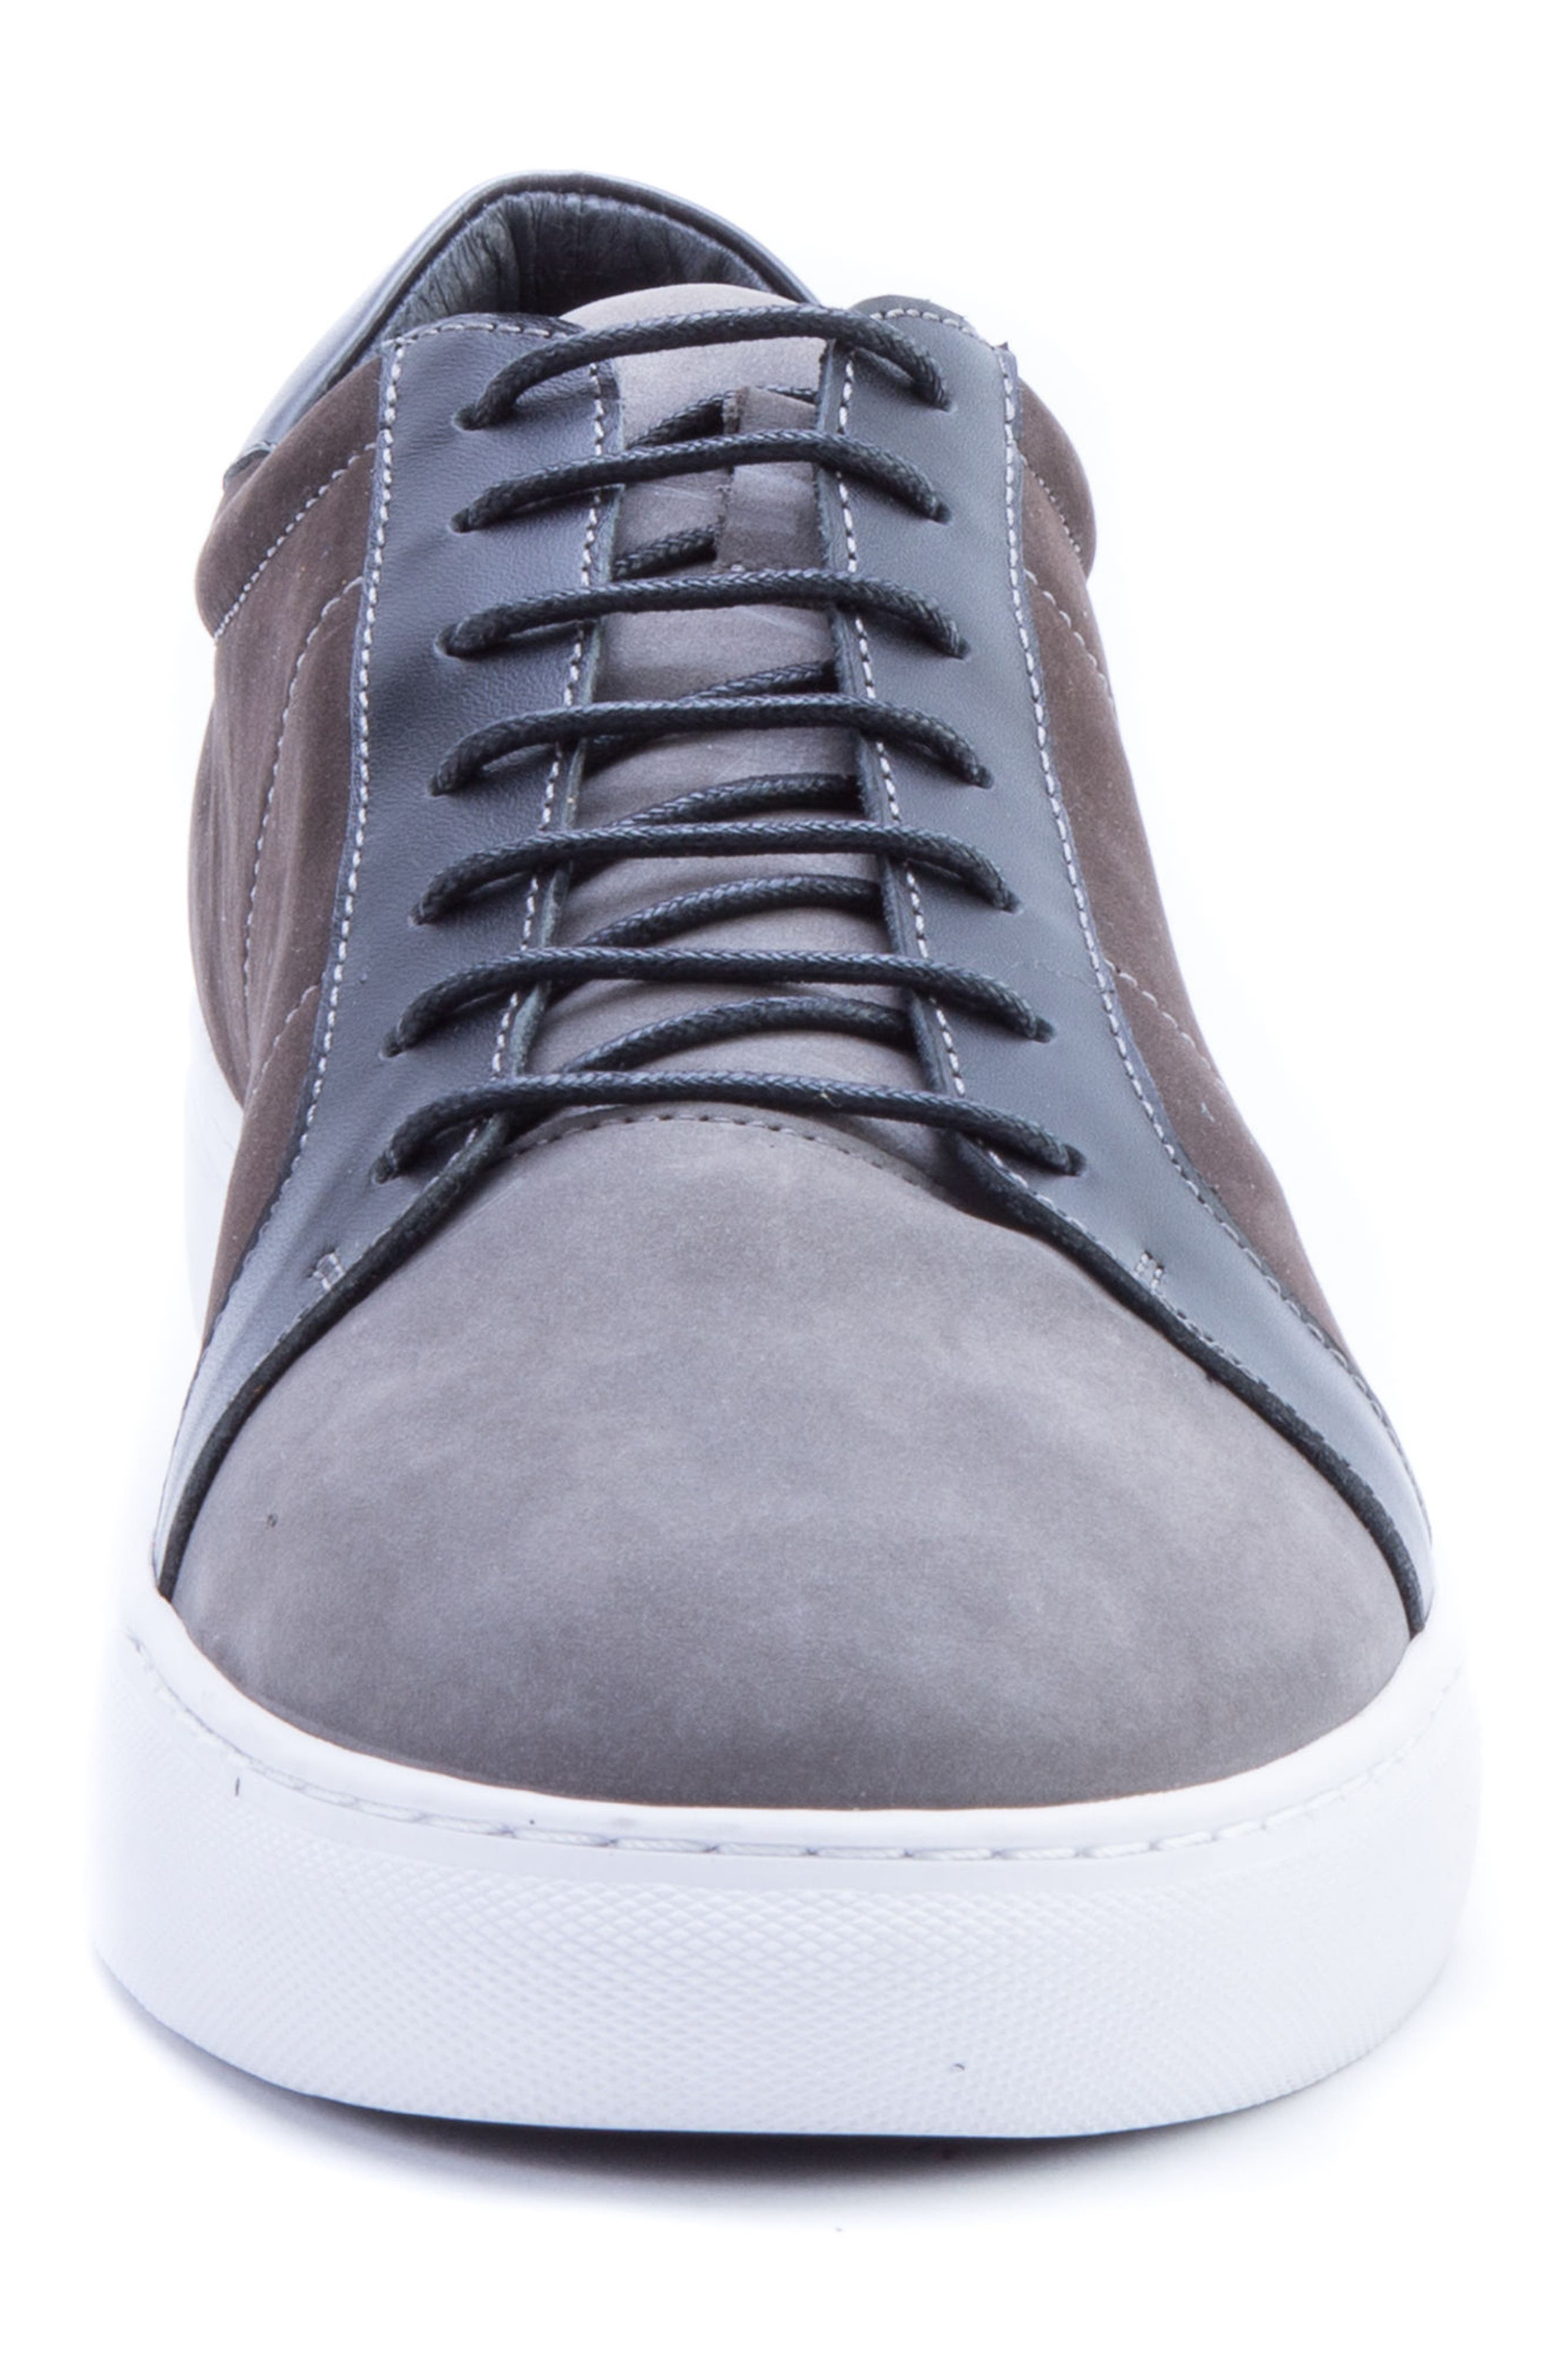 ROBERT GRAHAM, Gonzalo Low Top Sneaker, Alternate thumbnail 4, color, GREY SUEDE